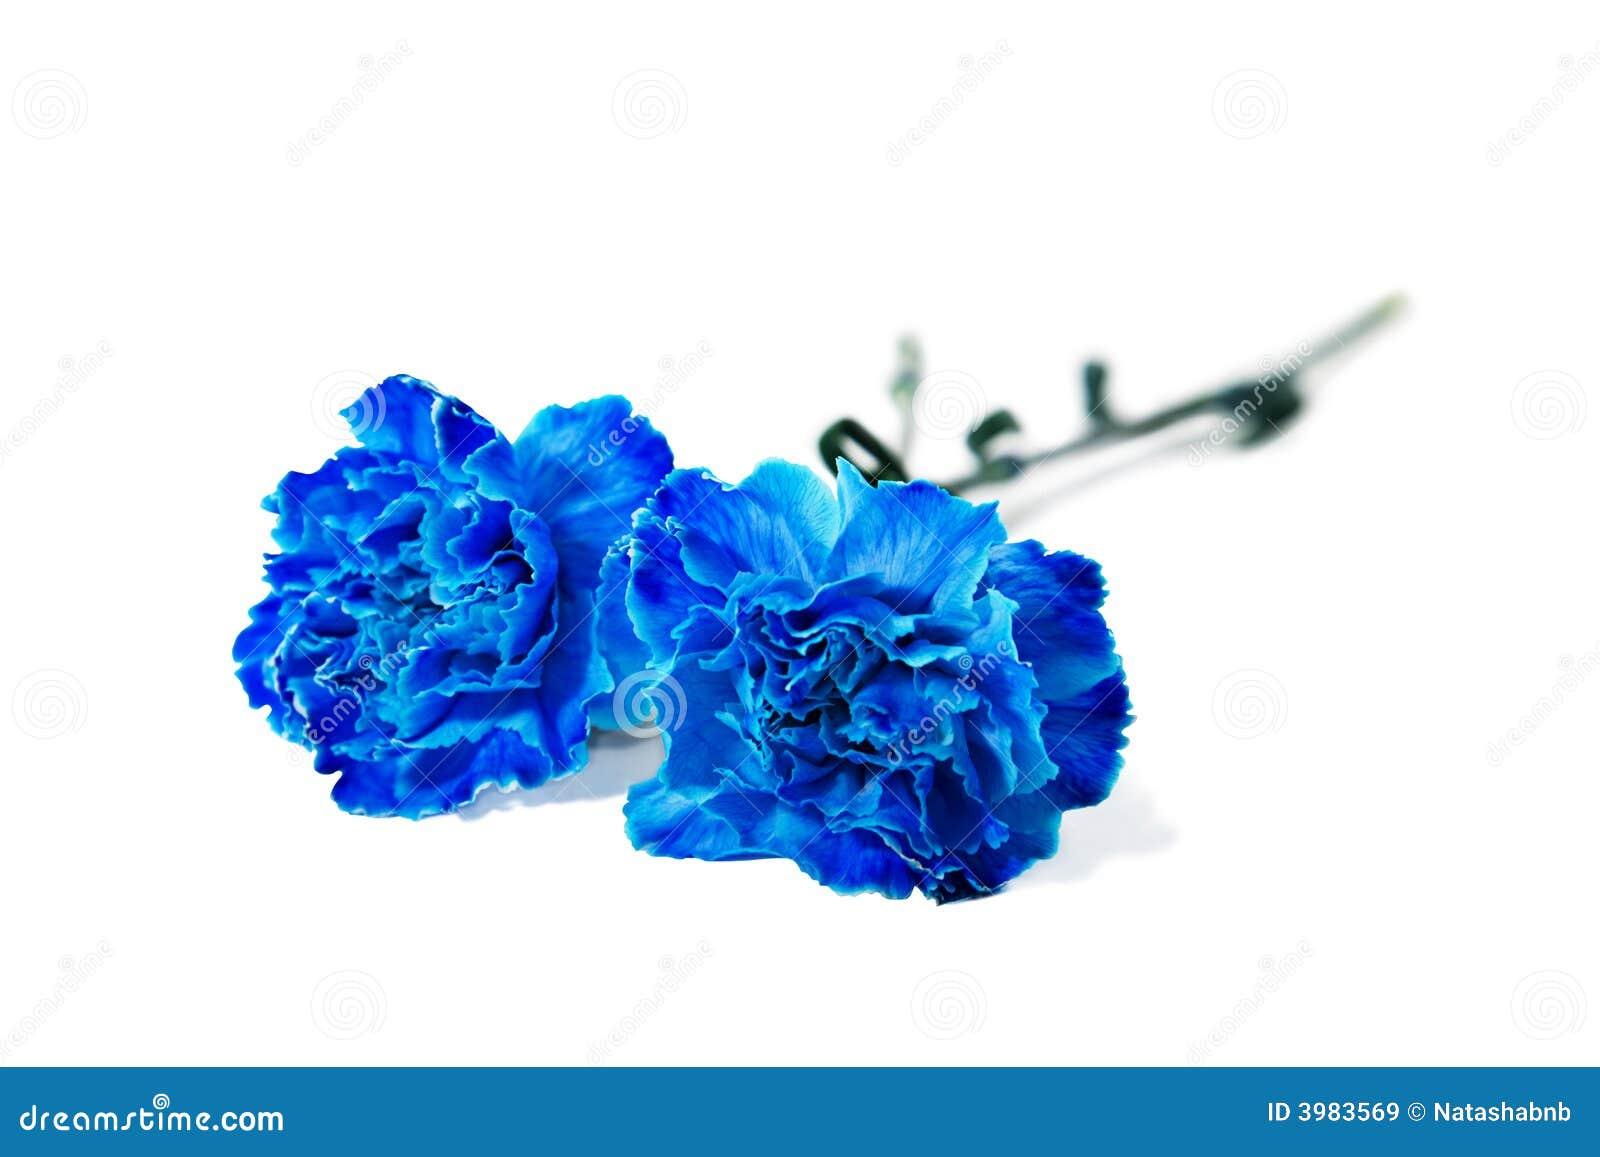 blue carnation stock image image of valentine bright